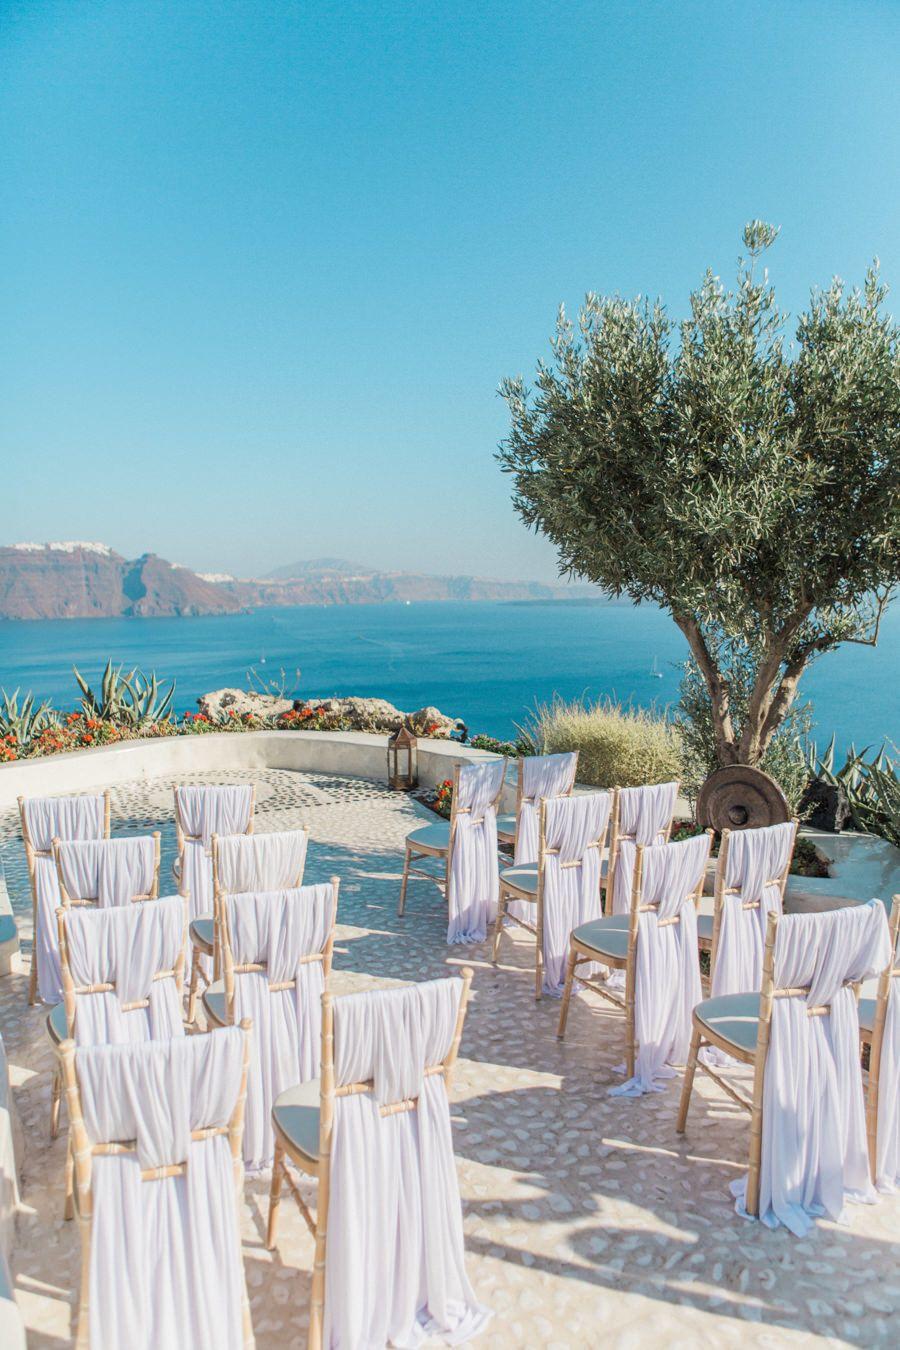 Santorini ceremony. Santorini Glam Weddings + Fabio Zardi. Photography: Anna Roussos - www.annaroussos.com